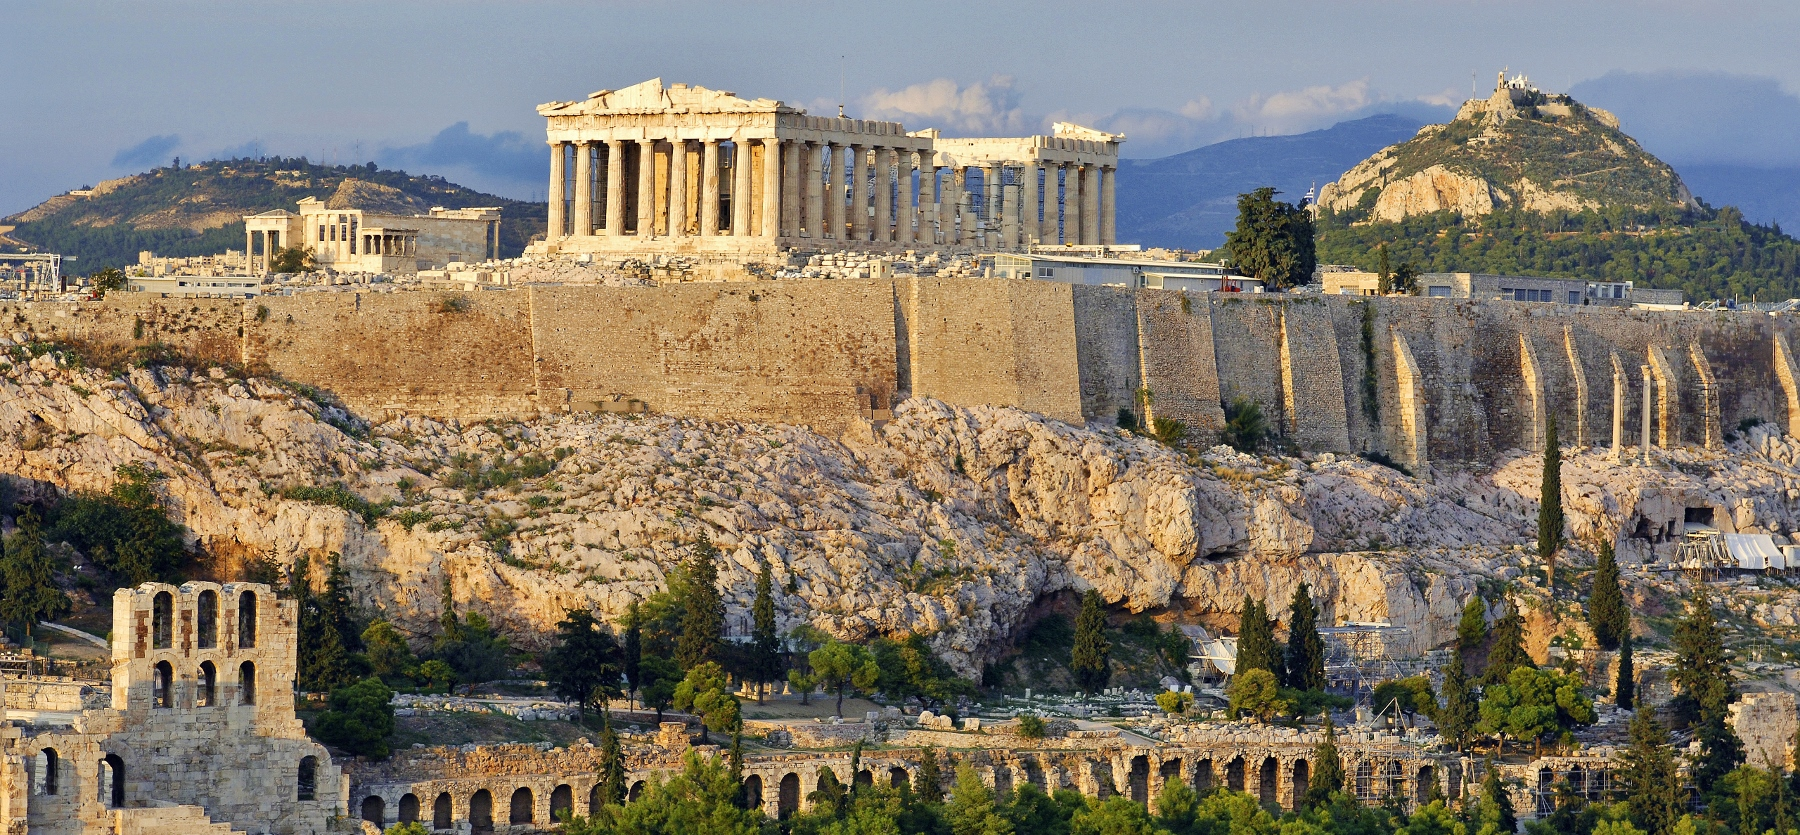 Overnachting in Athene - de Acropolis